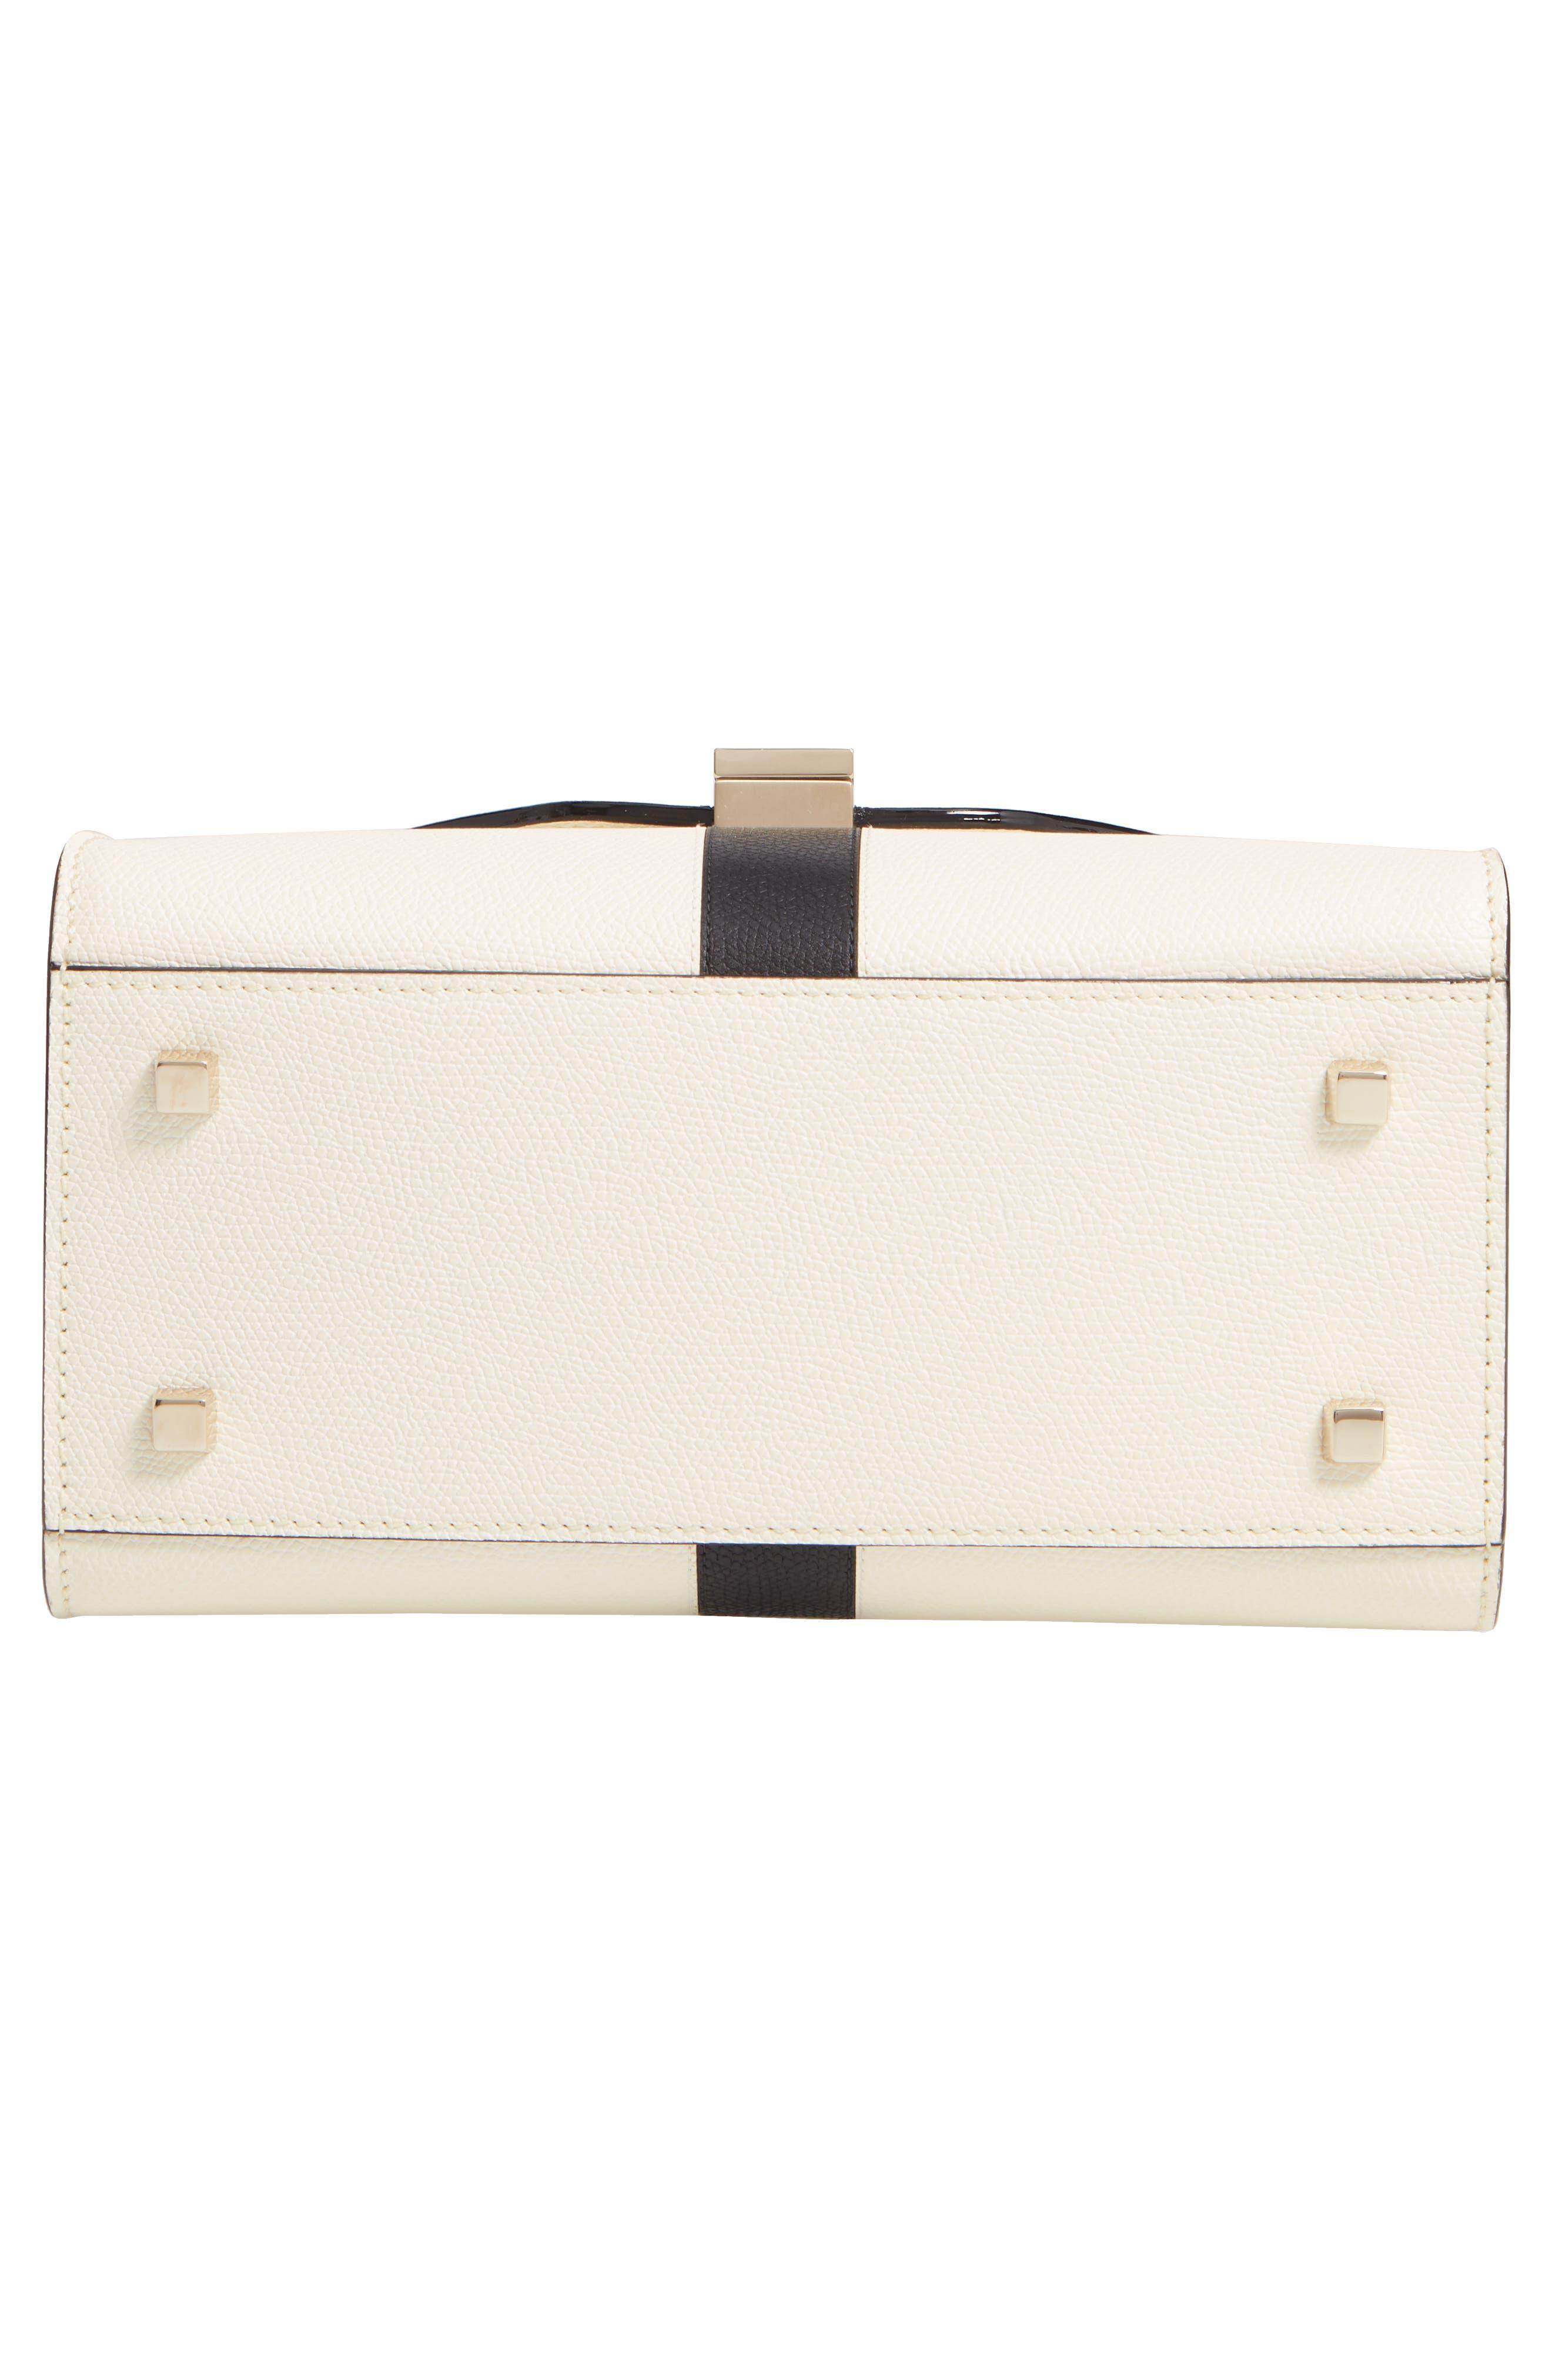 Mini Iside Top Handle Bag,                             Alternate thumbnail 6, color,                             WHITE/ BLACK